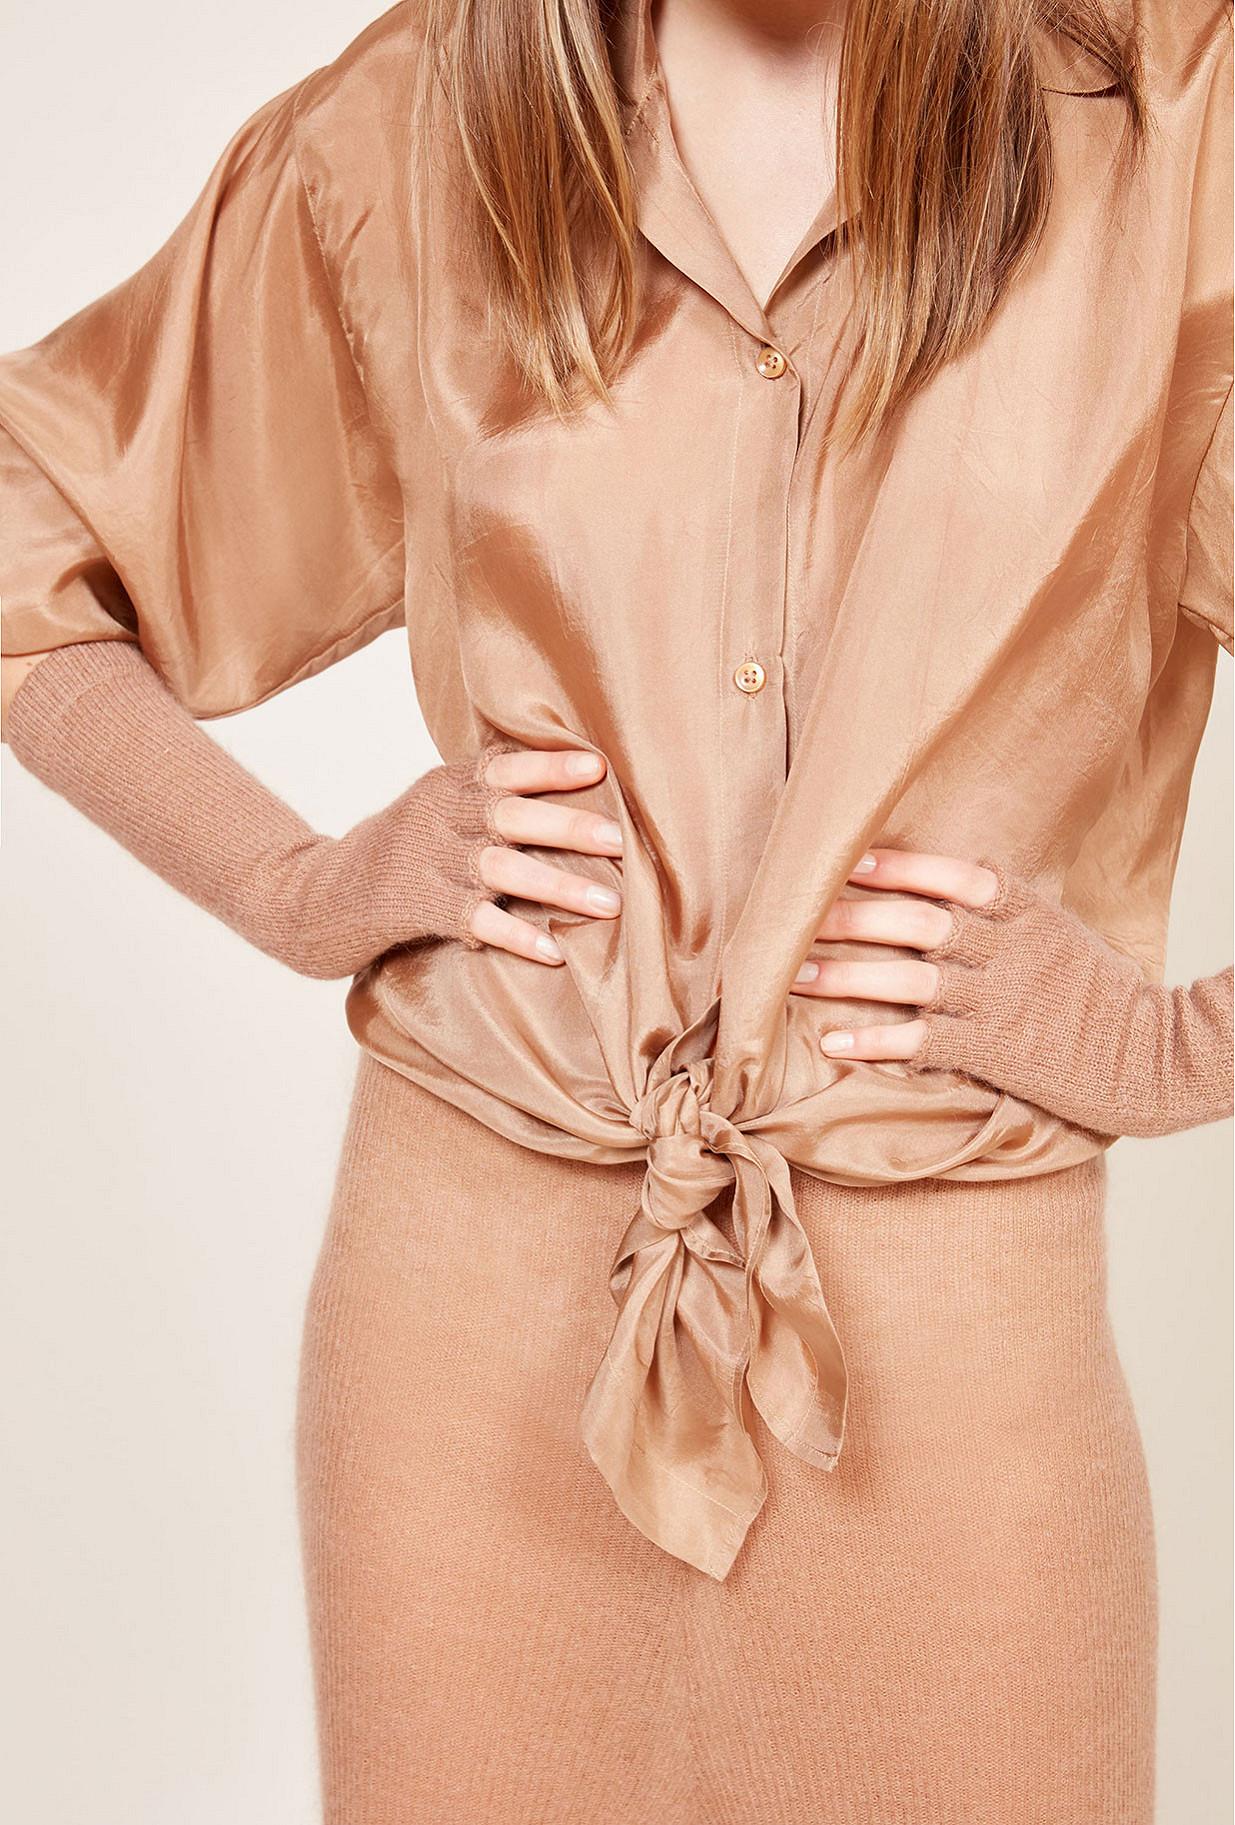 Terracotta  Mittens  Sade Mes demoiselles fashion clothes designer Paris